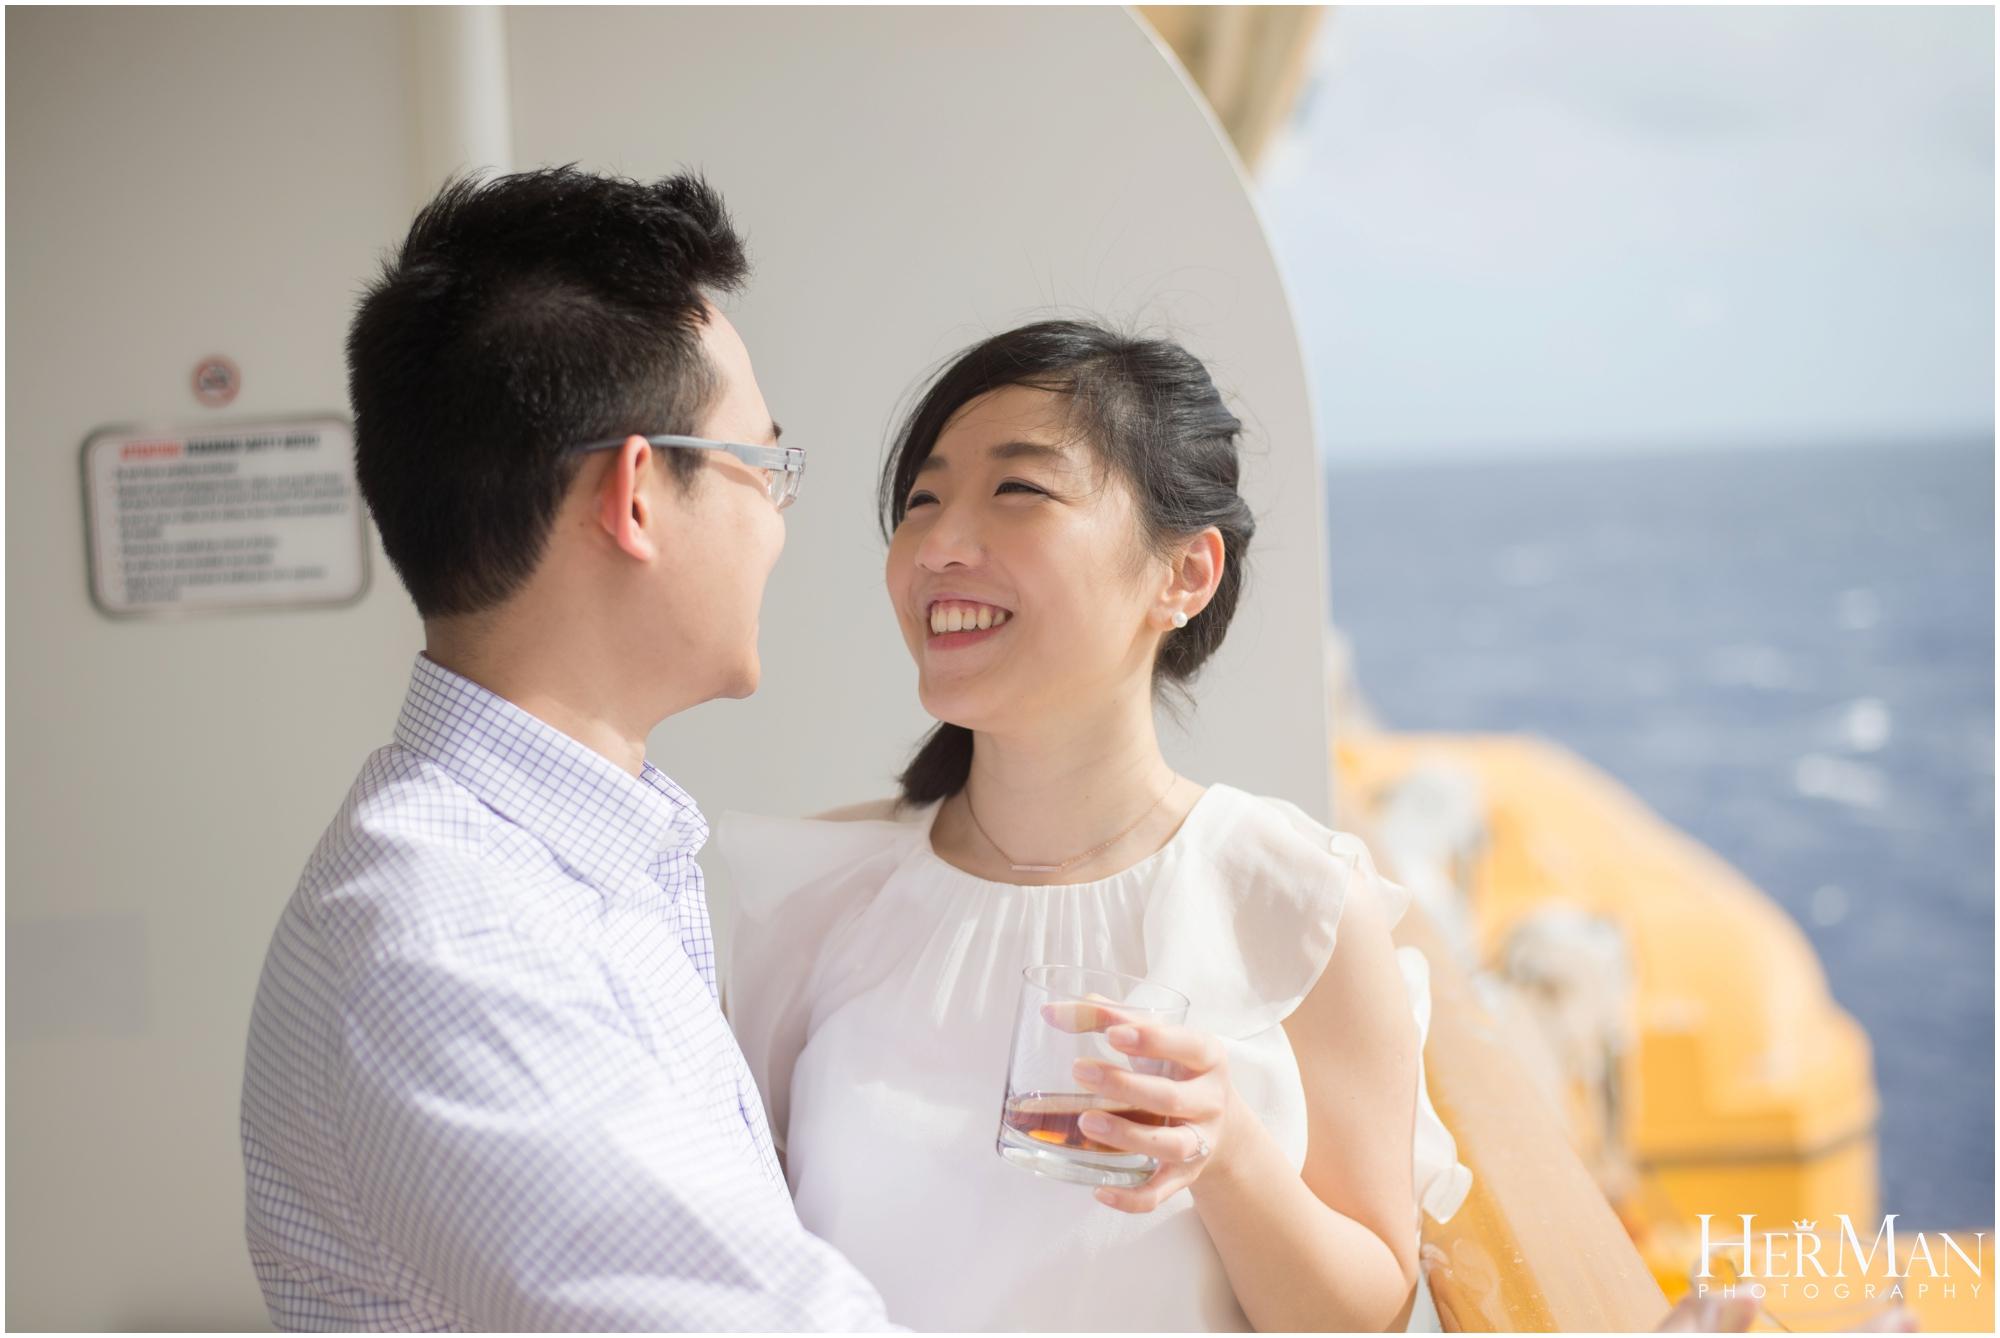 disney-fantasy-cruise-wedding-HerMan-photography_0007.jpg